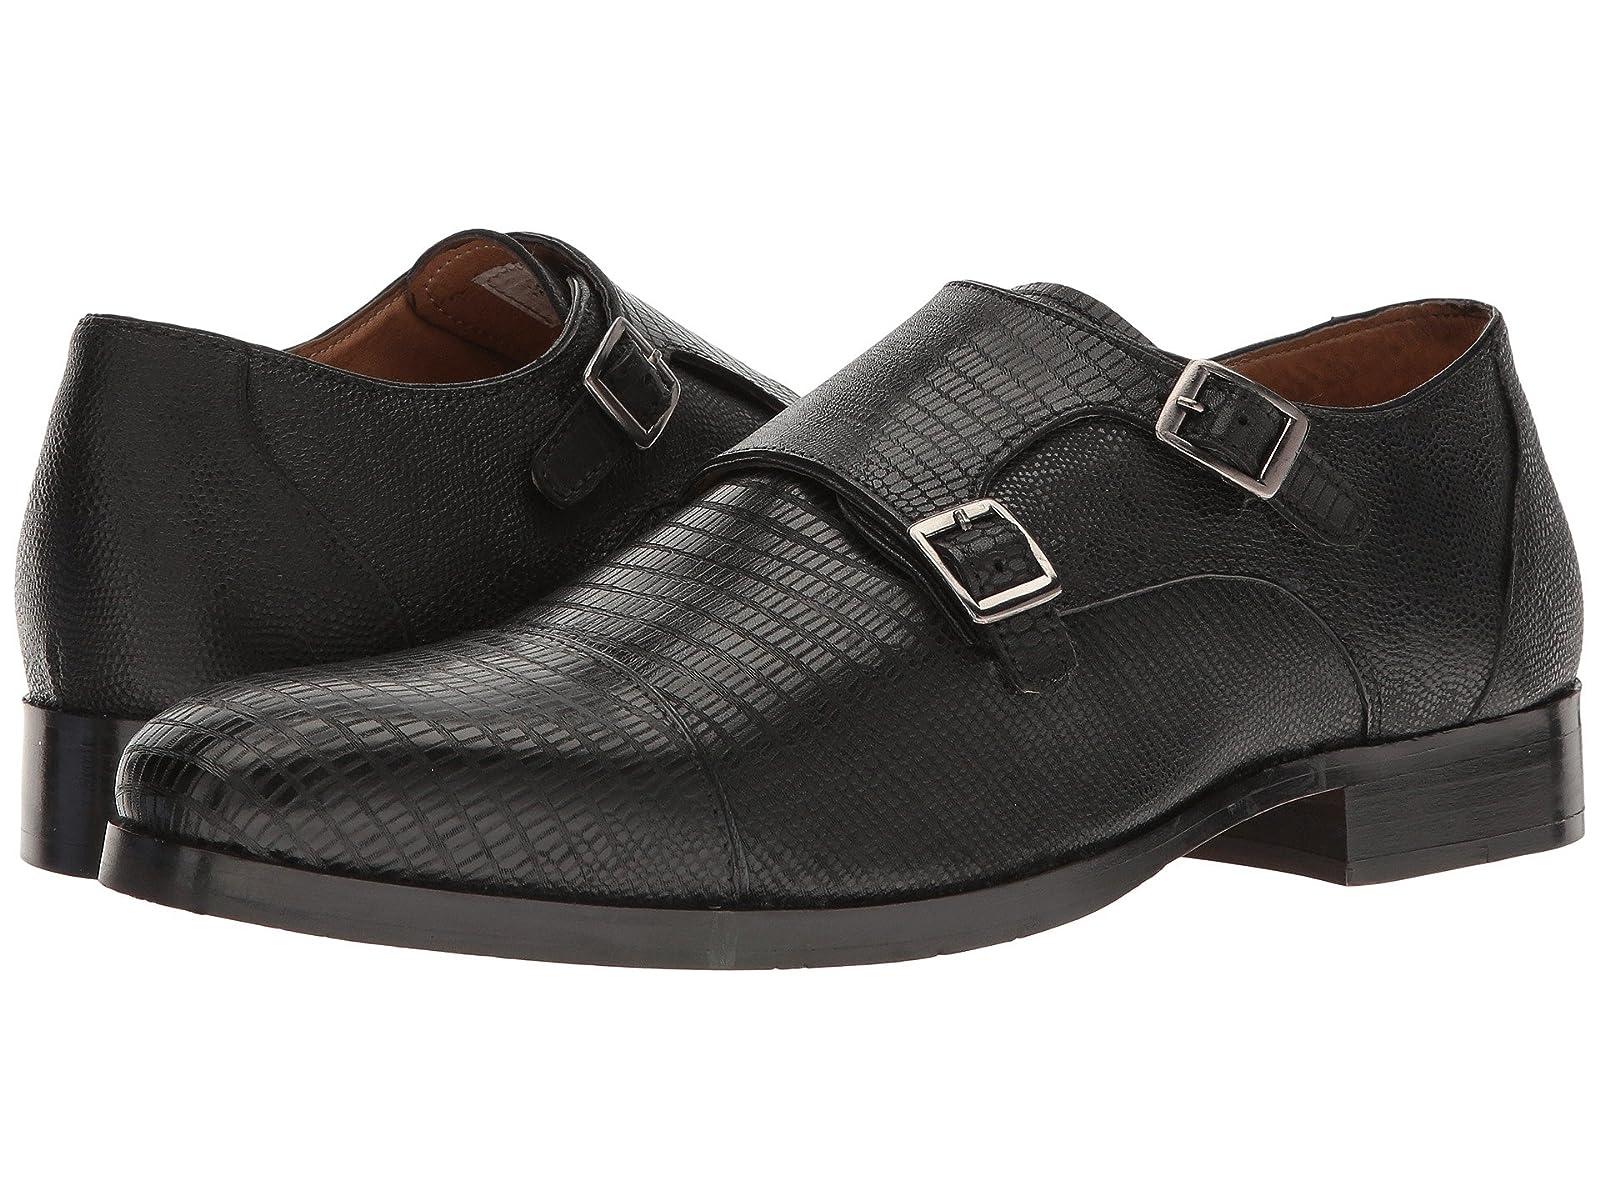 Steve Madden RocodileCheap and distinctive eye-catching shoes